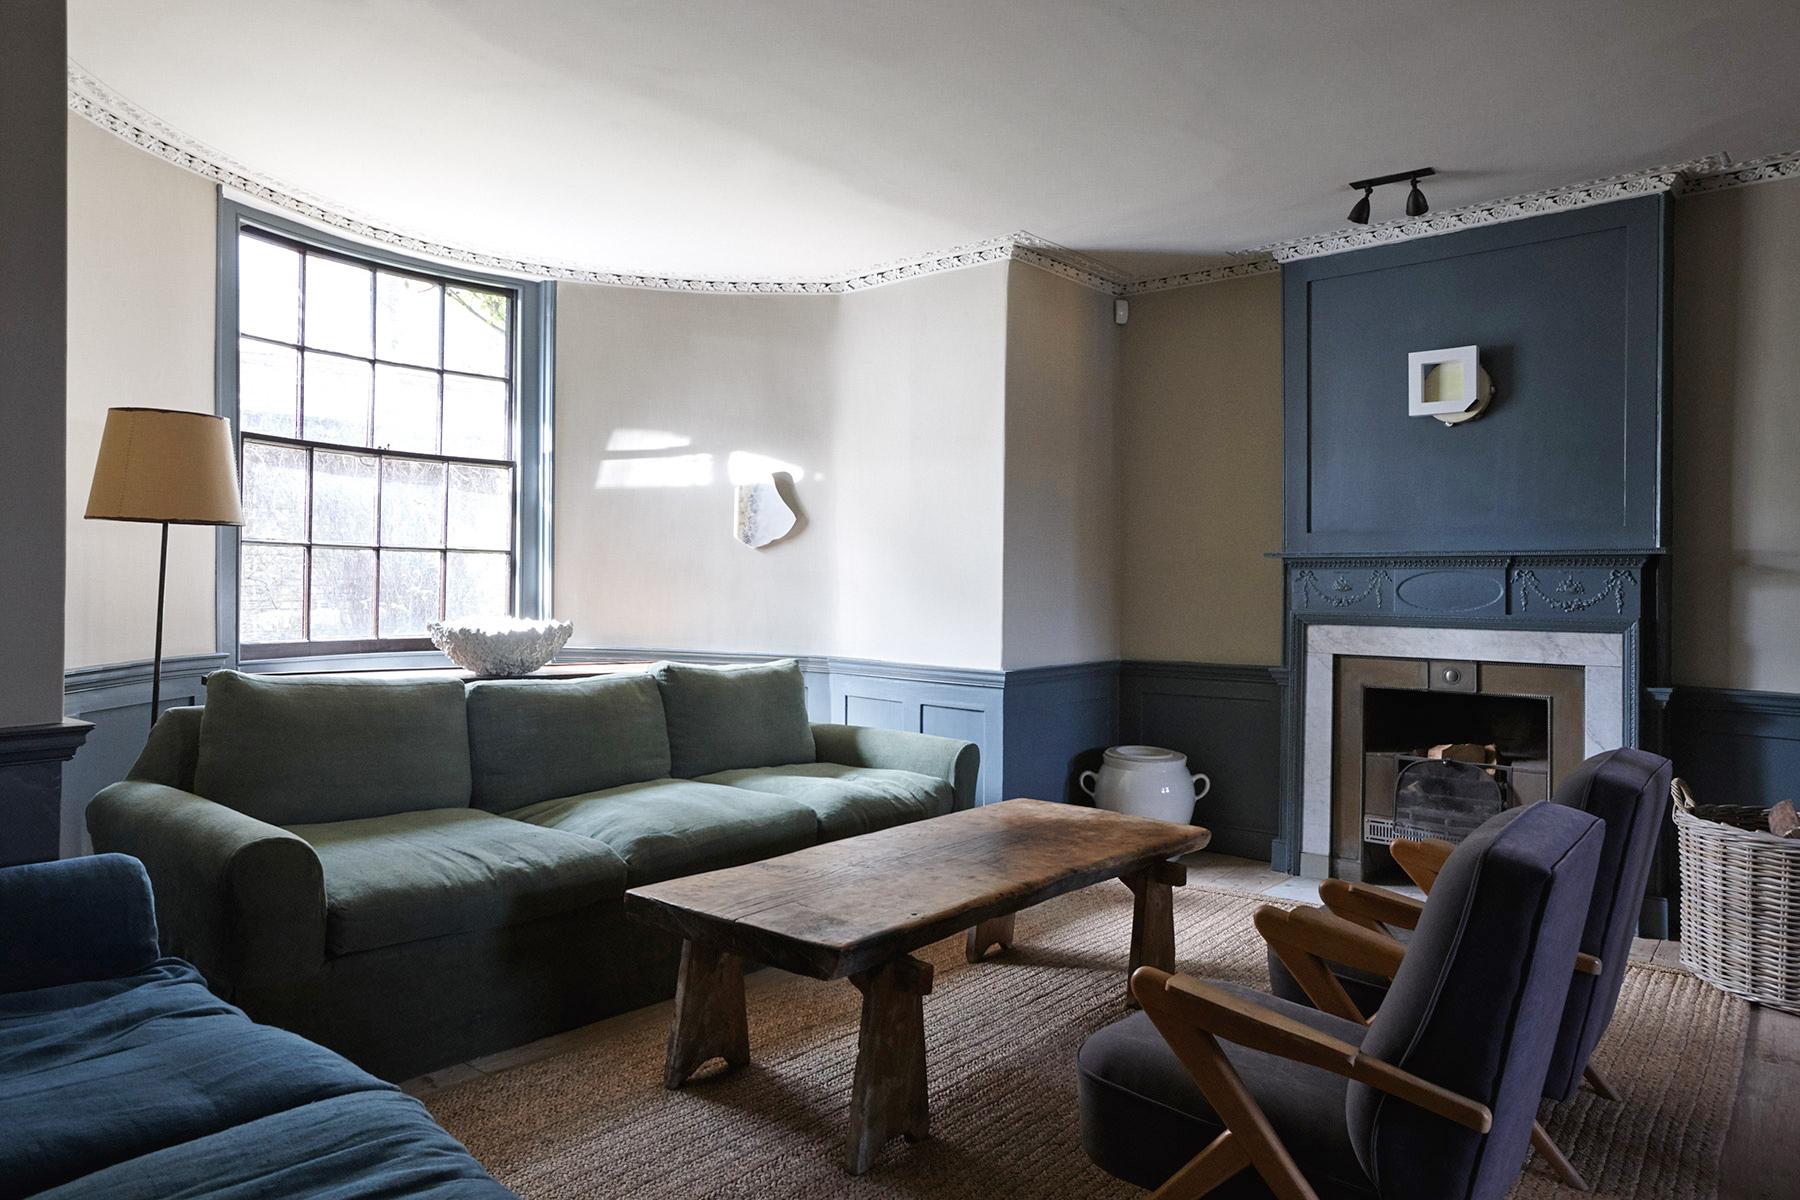 londra un airbnb a 5 stelle living corriere